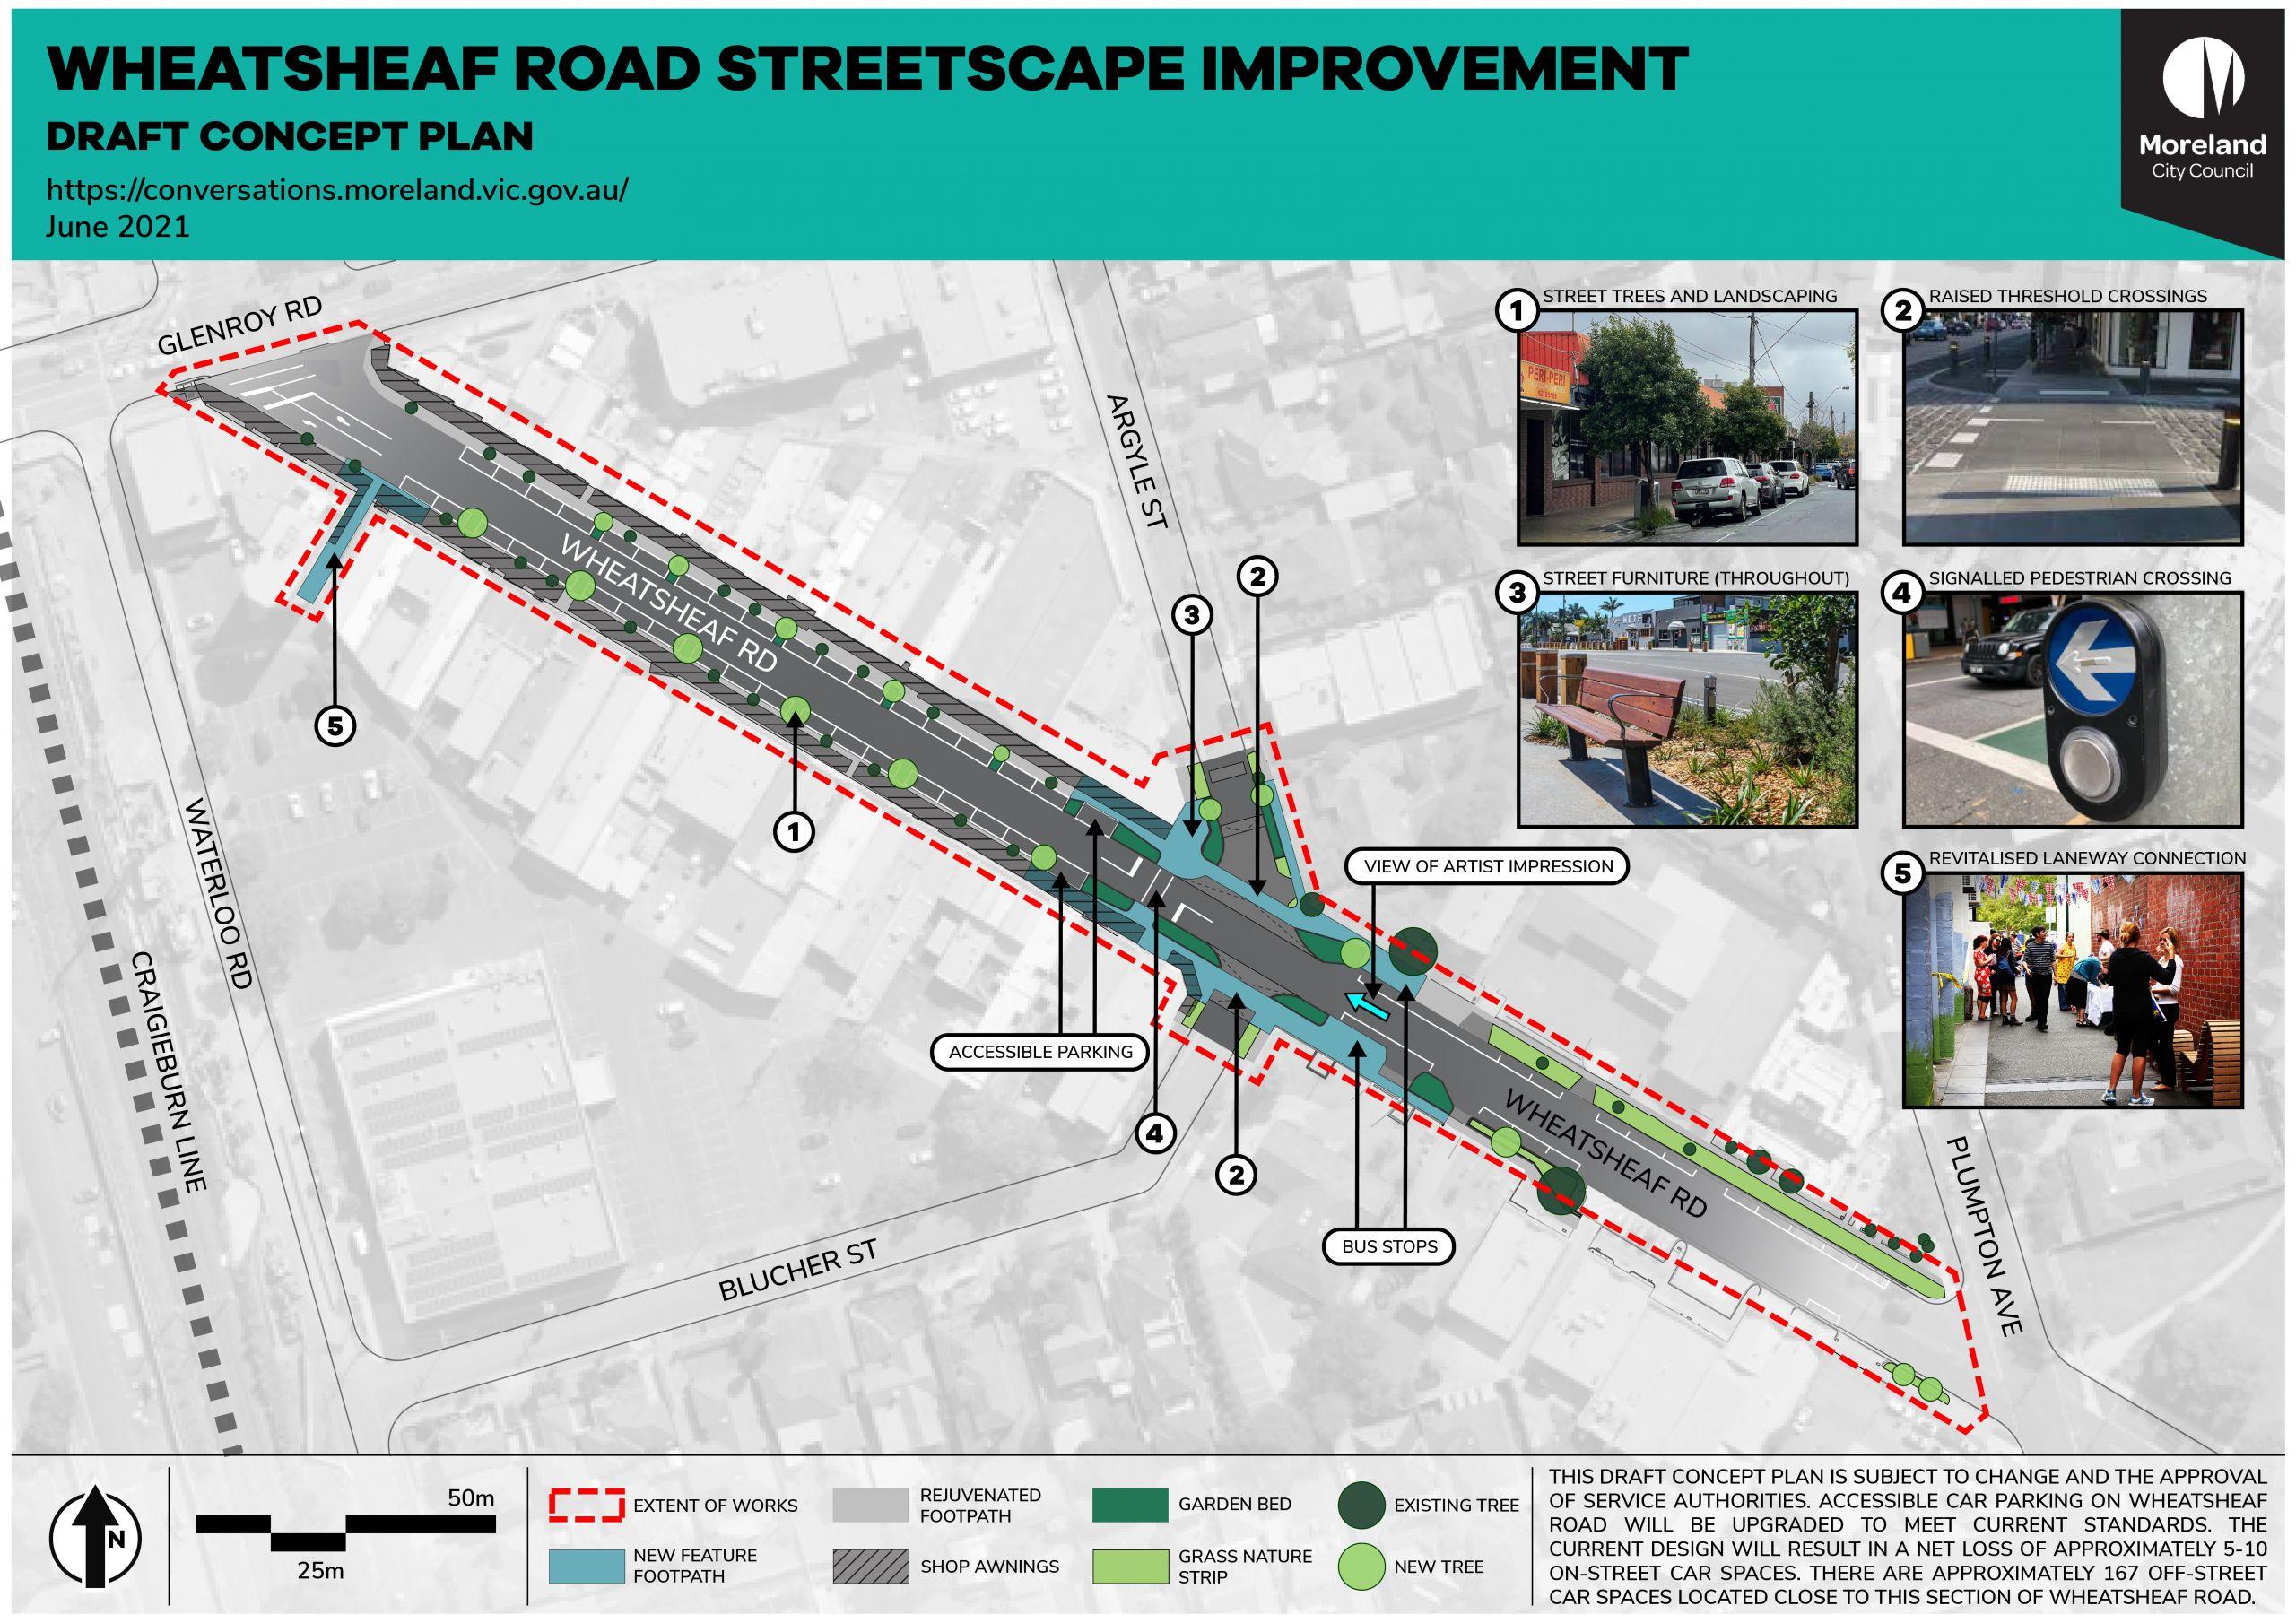 Wheatsheaf Road Streetscape Improvement Draft Concept Plan